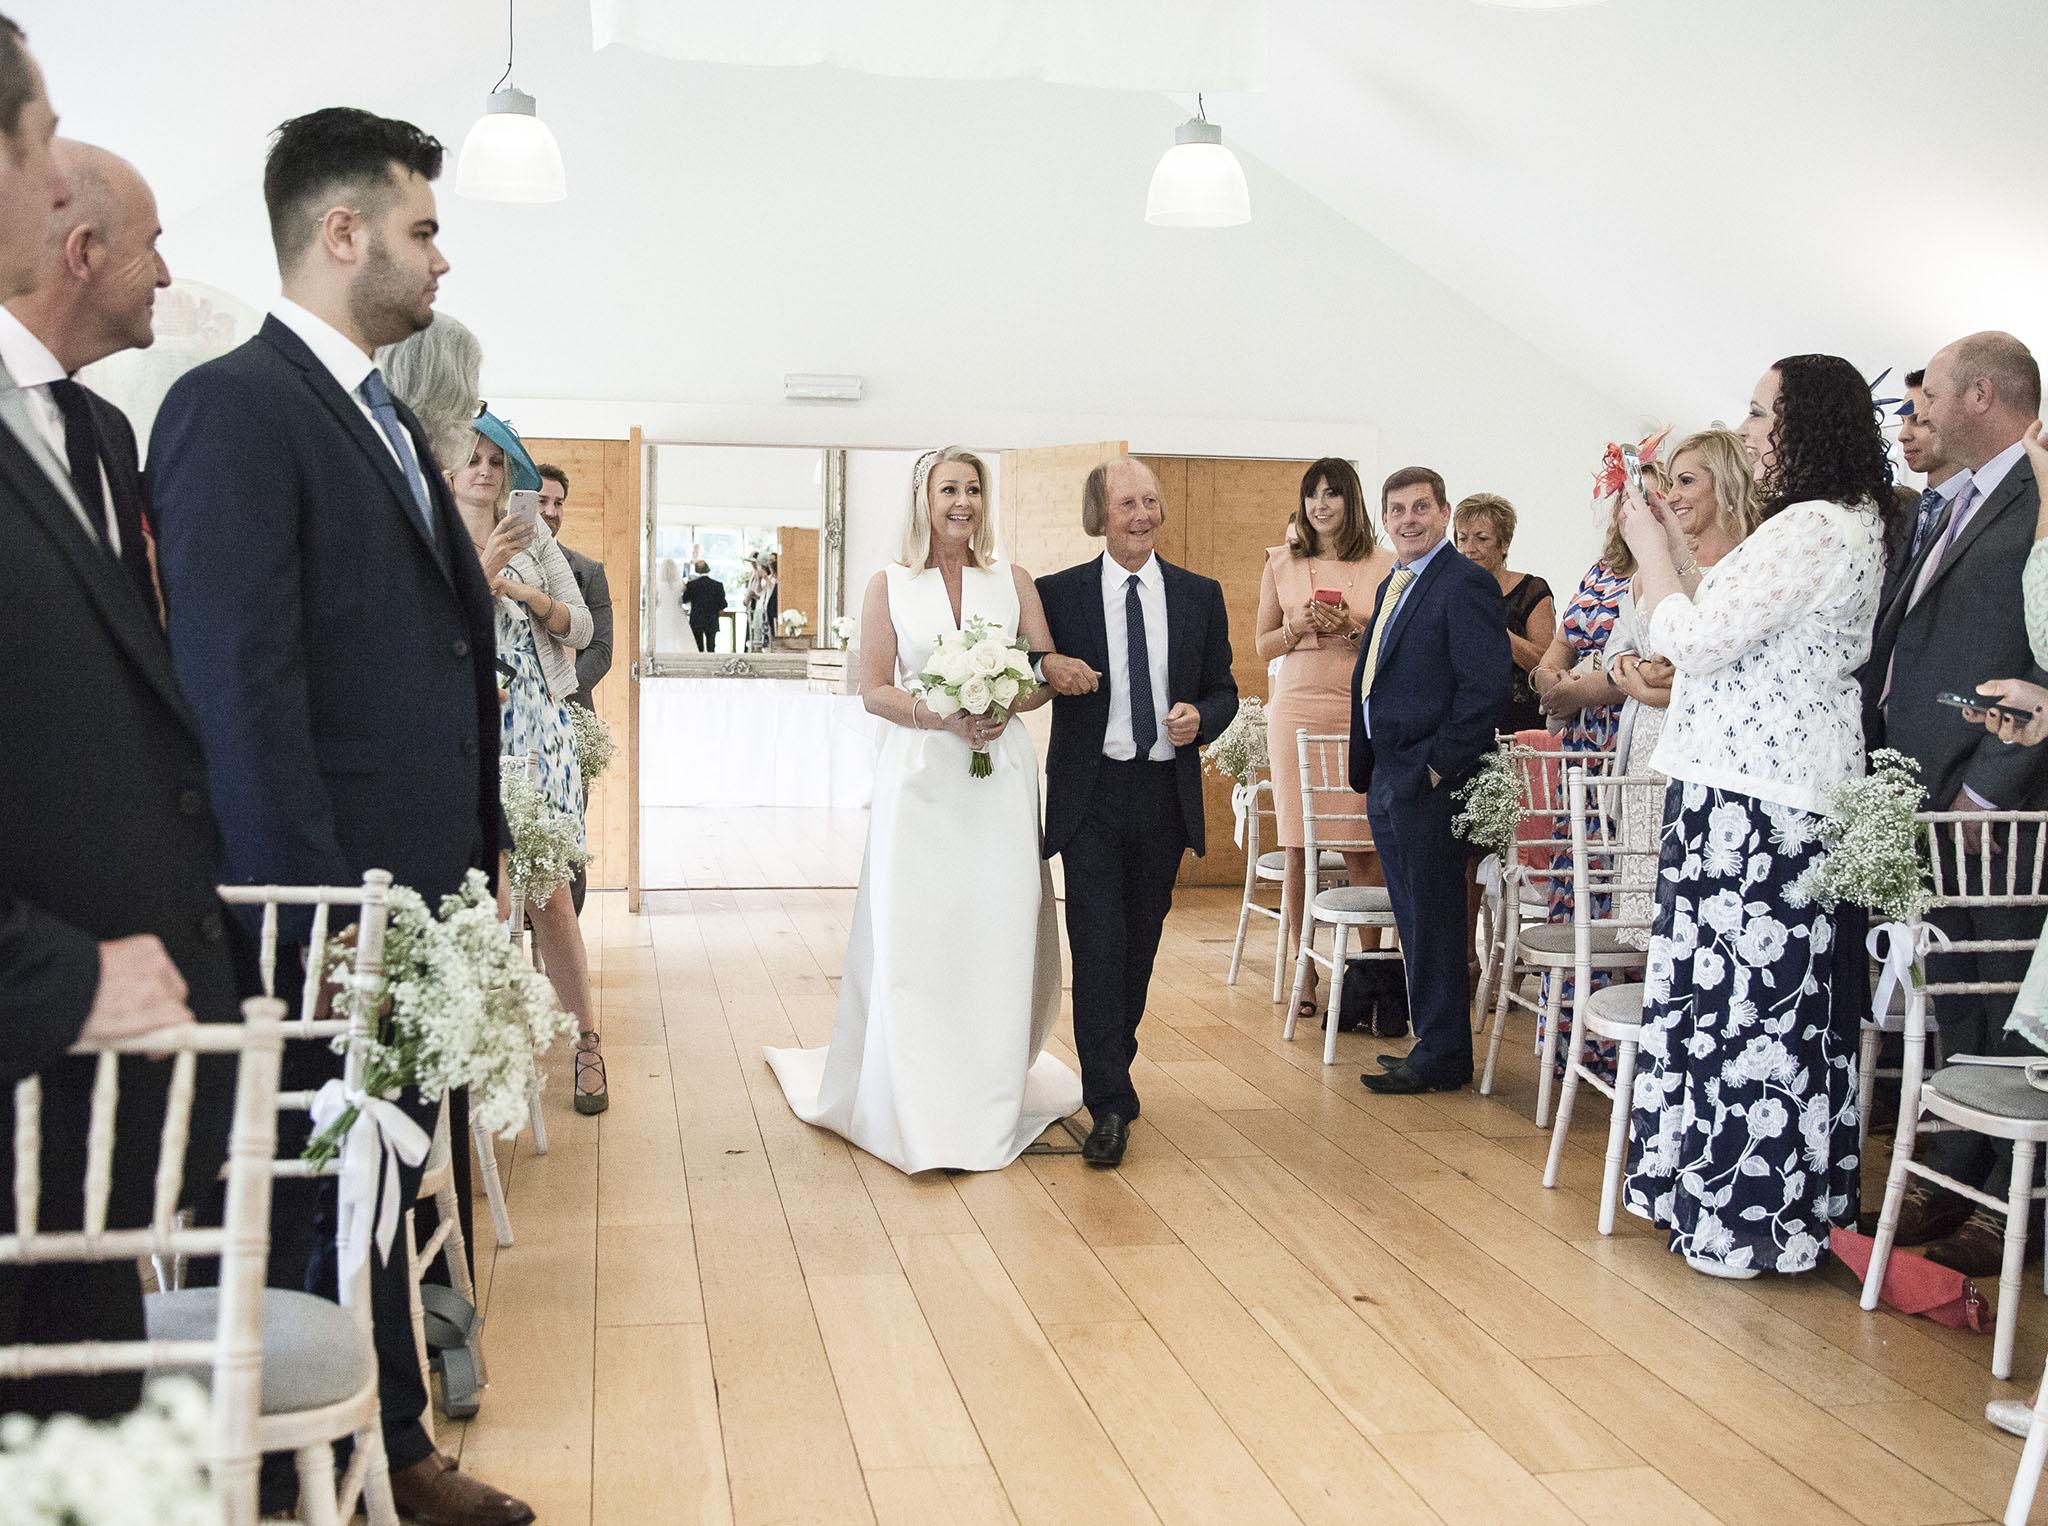 elizabethg_photography_hertfordshire_fineart_photographer_tonycharlie_wedding_photography_aldermaston_wasing_park_reading_23.jpg